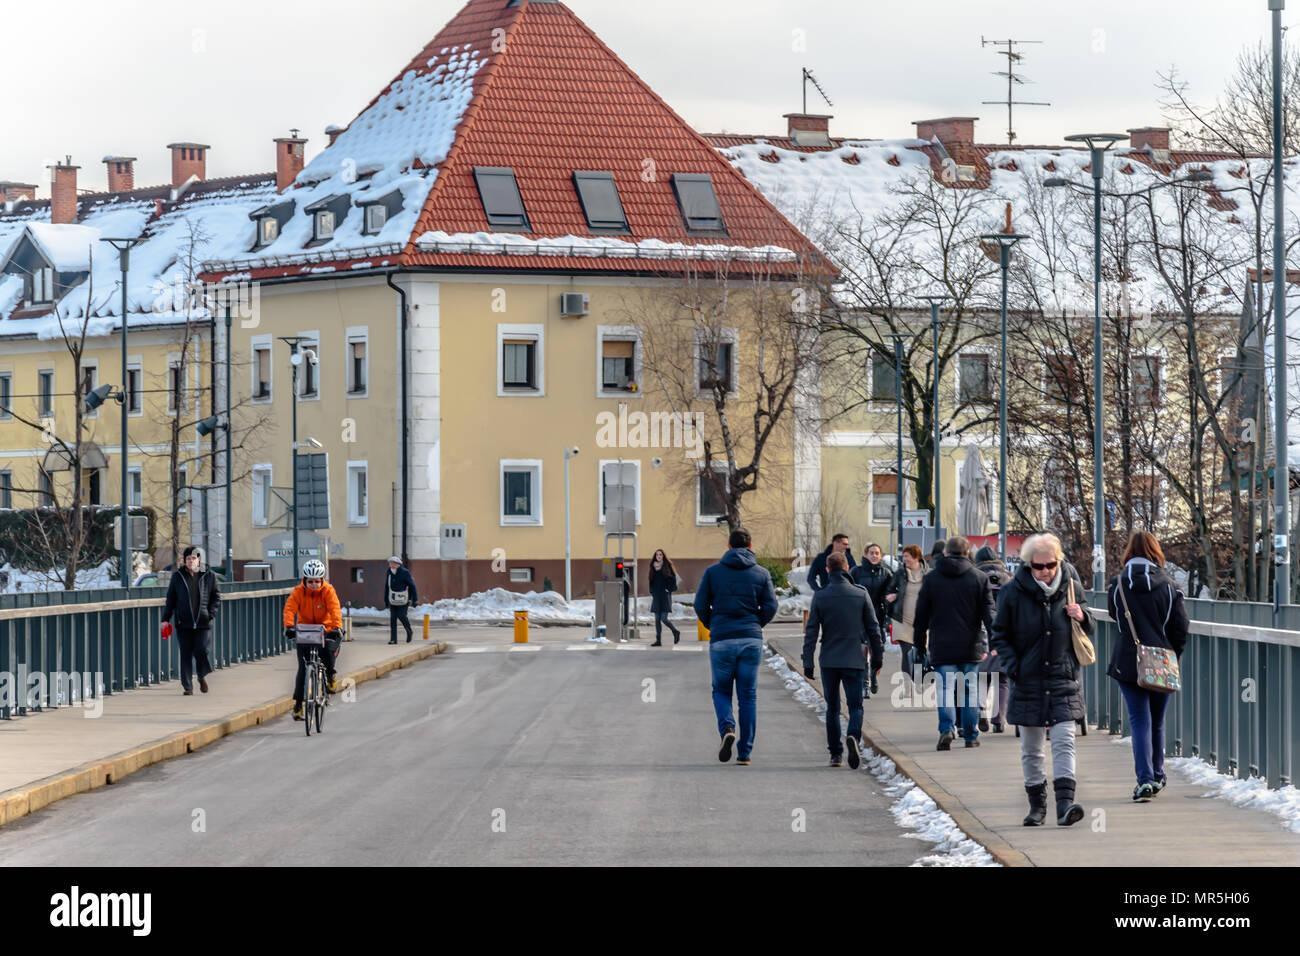 Postna ulica - Stock Image